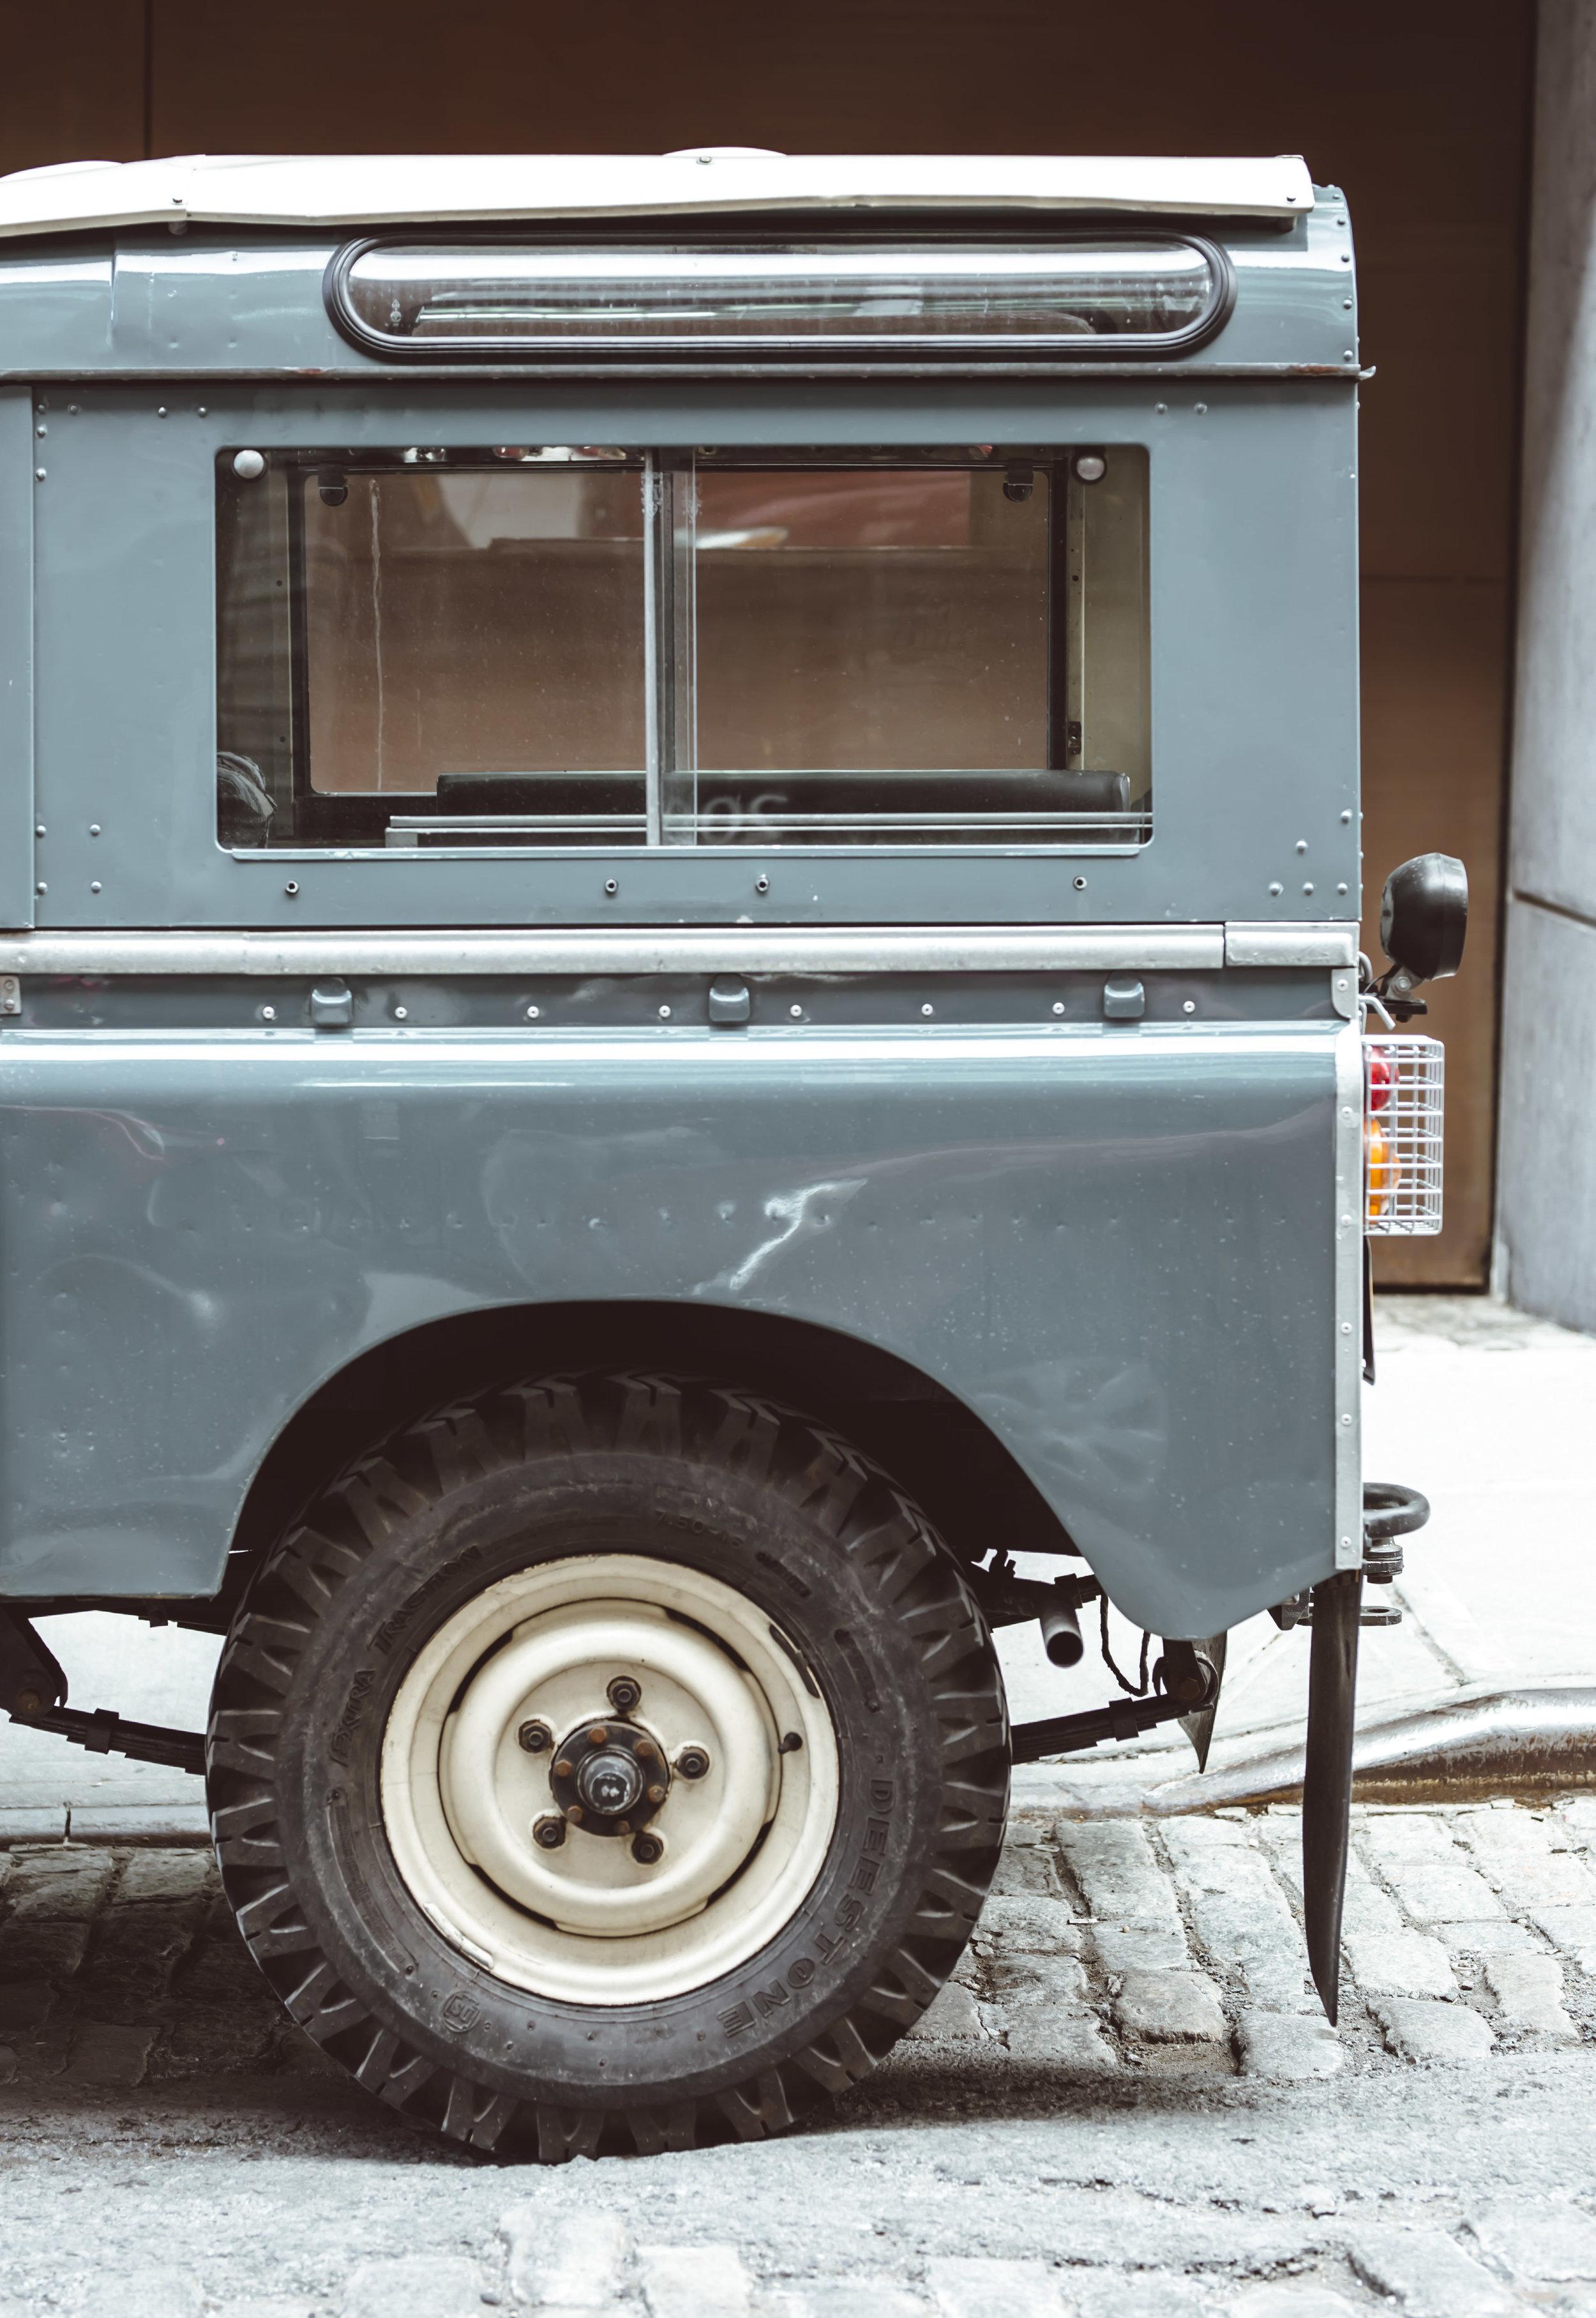 2xlarge_1972_Land_Rover_Series_III_01.jpg